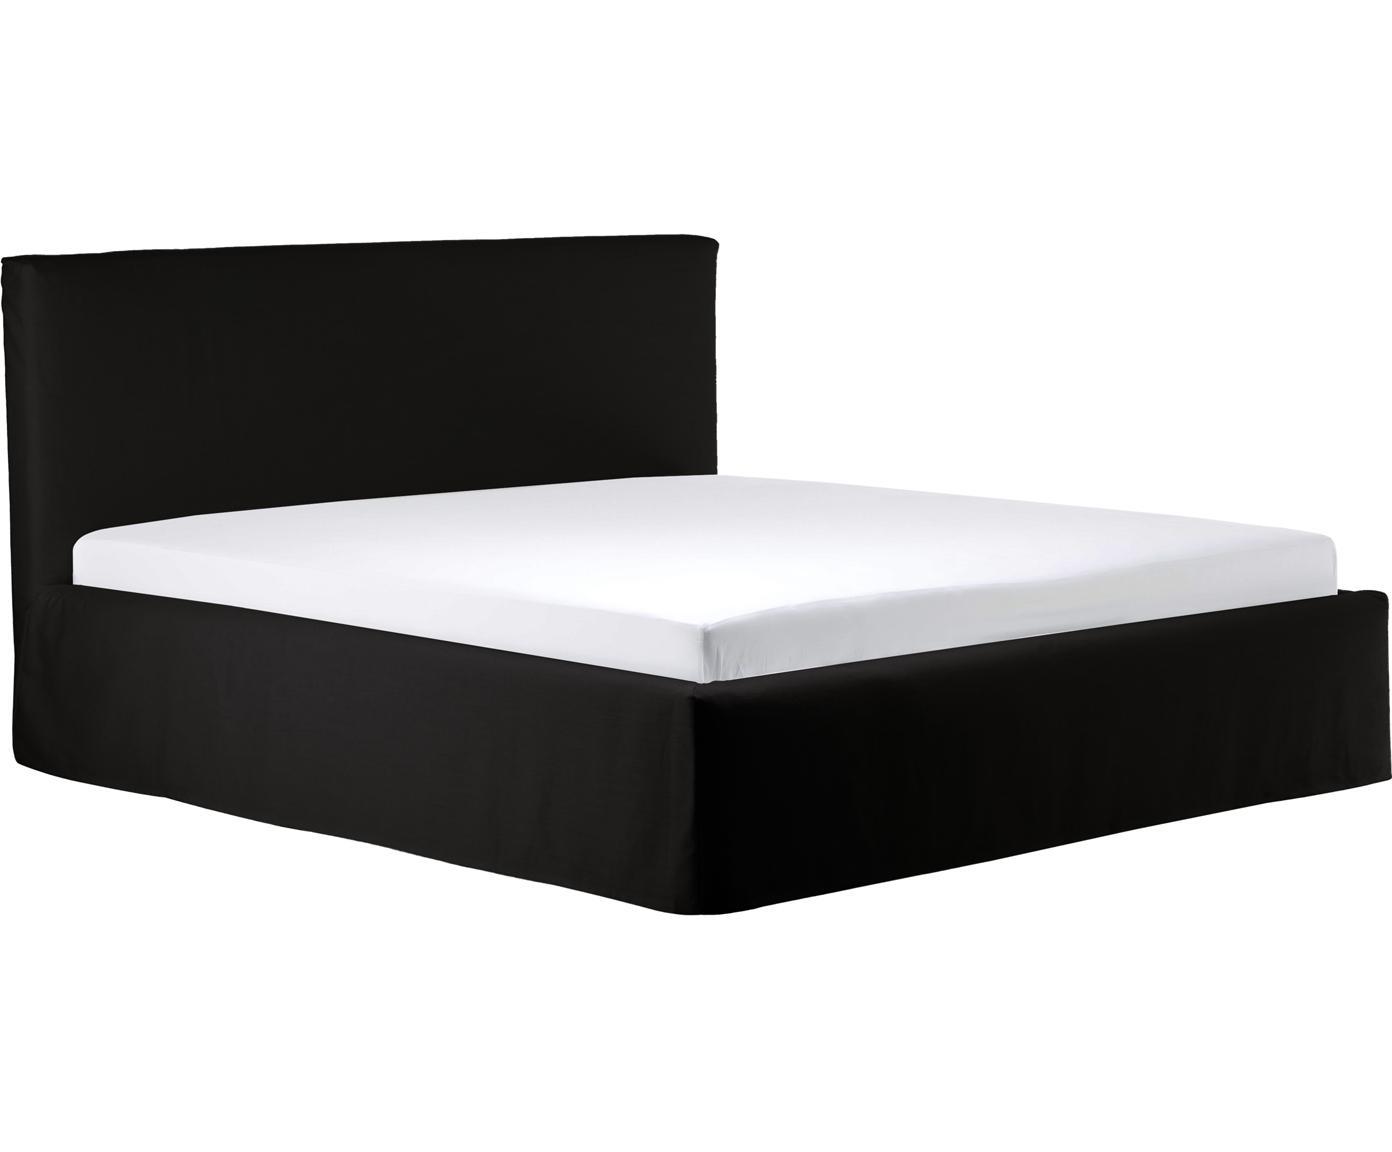 Gestoffeerd bed Feather met opbergruimte, Frame: massief grenenhout, Bekleding: polyester (structuurmater, Donkergrijs, 140 x 200 cm